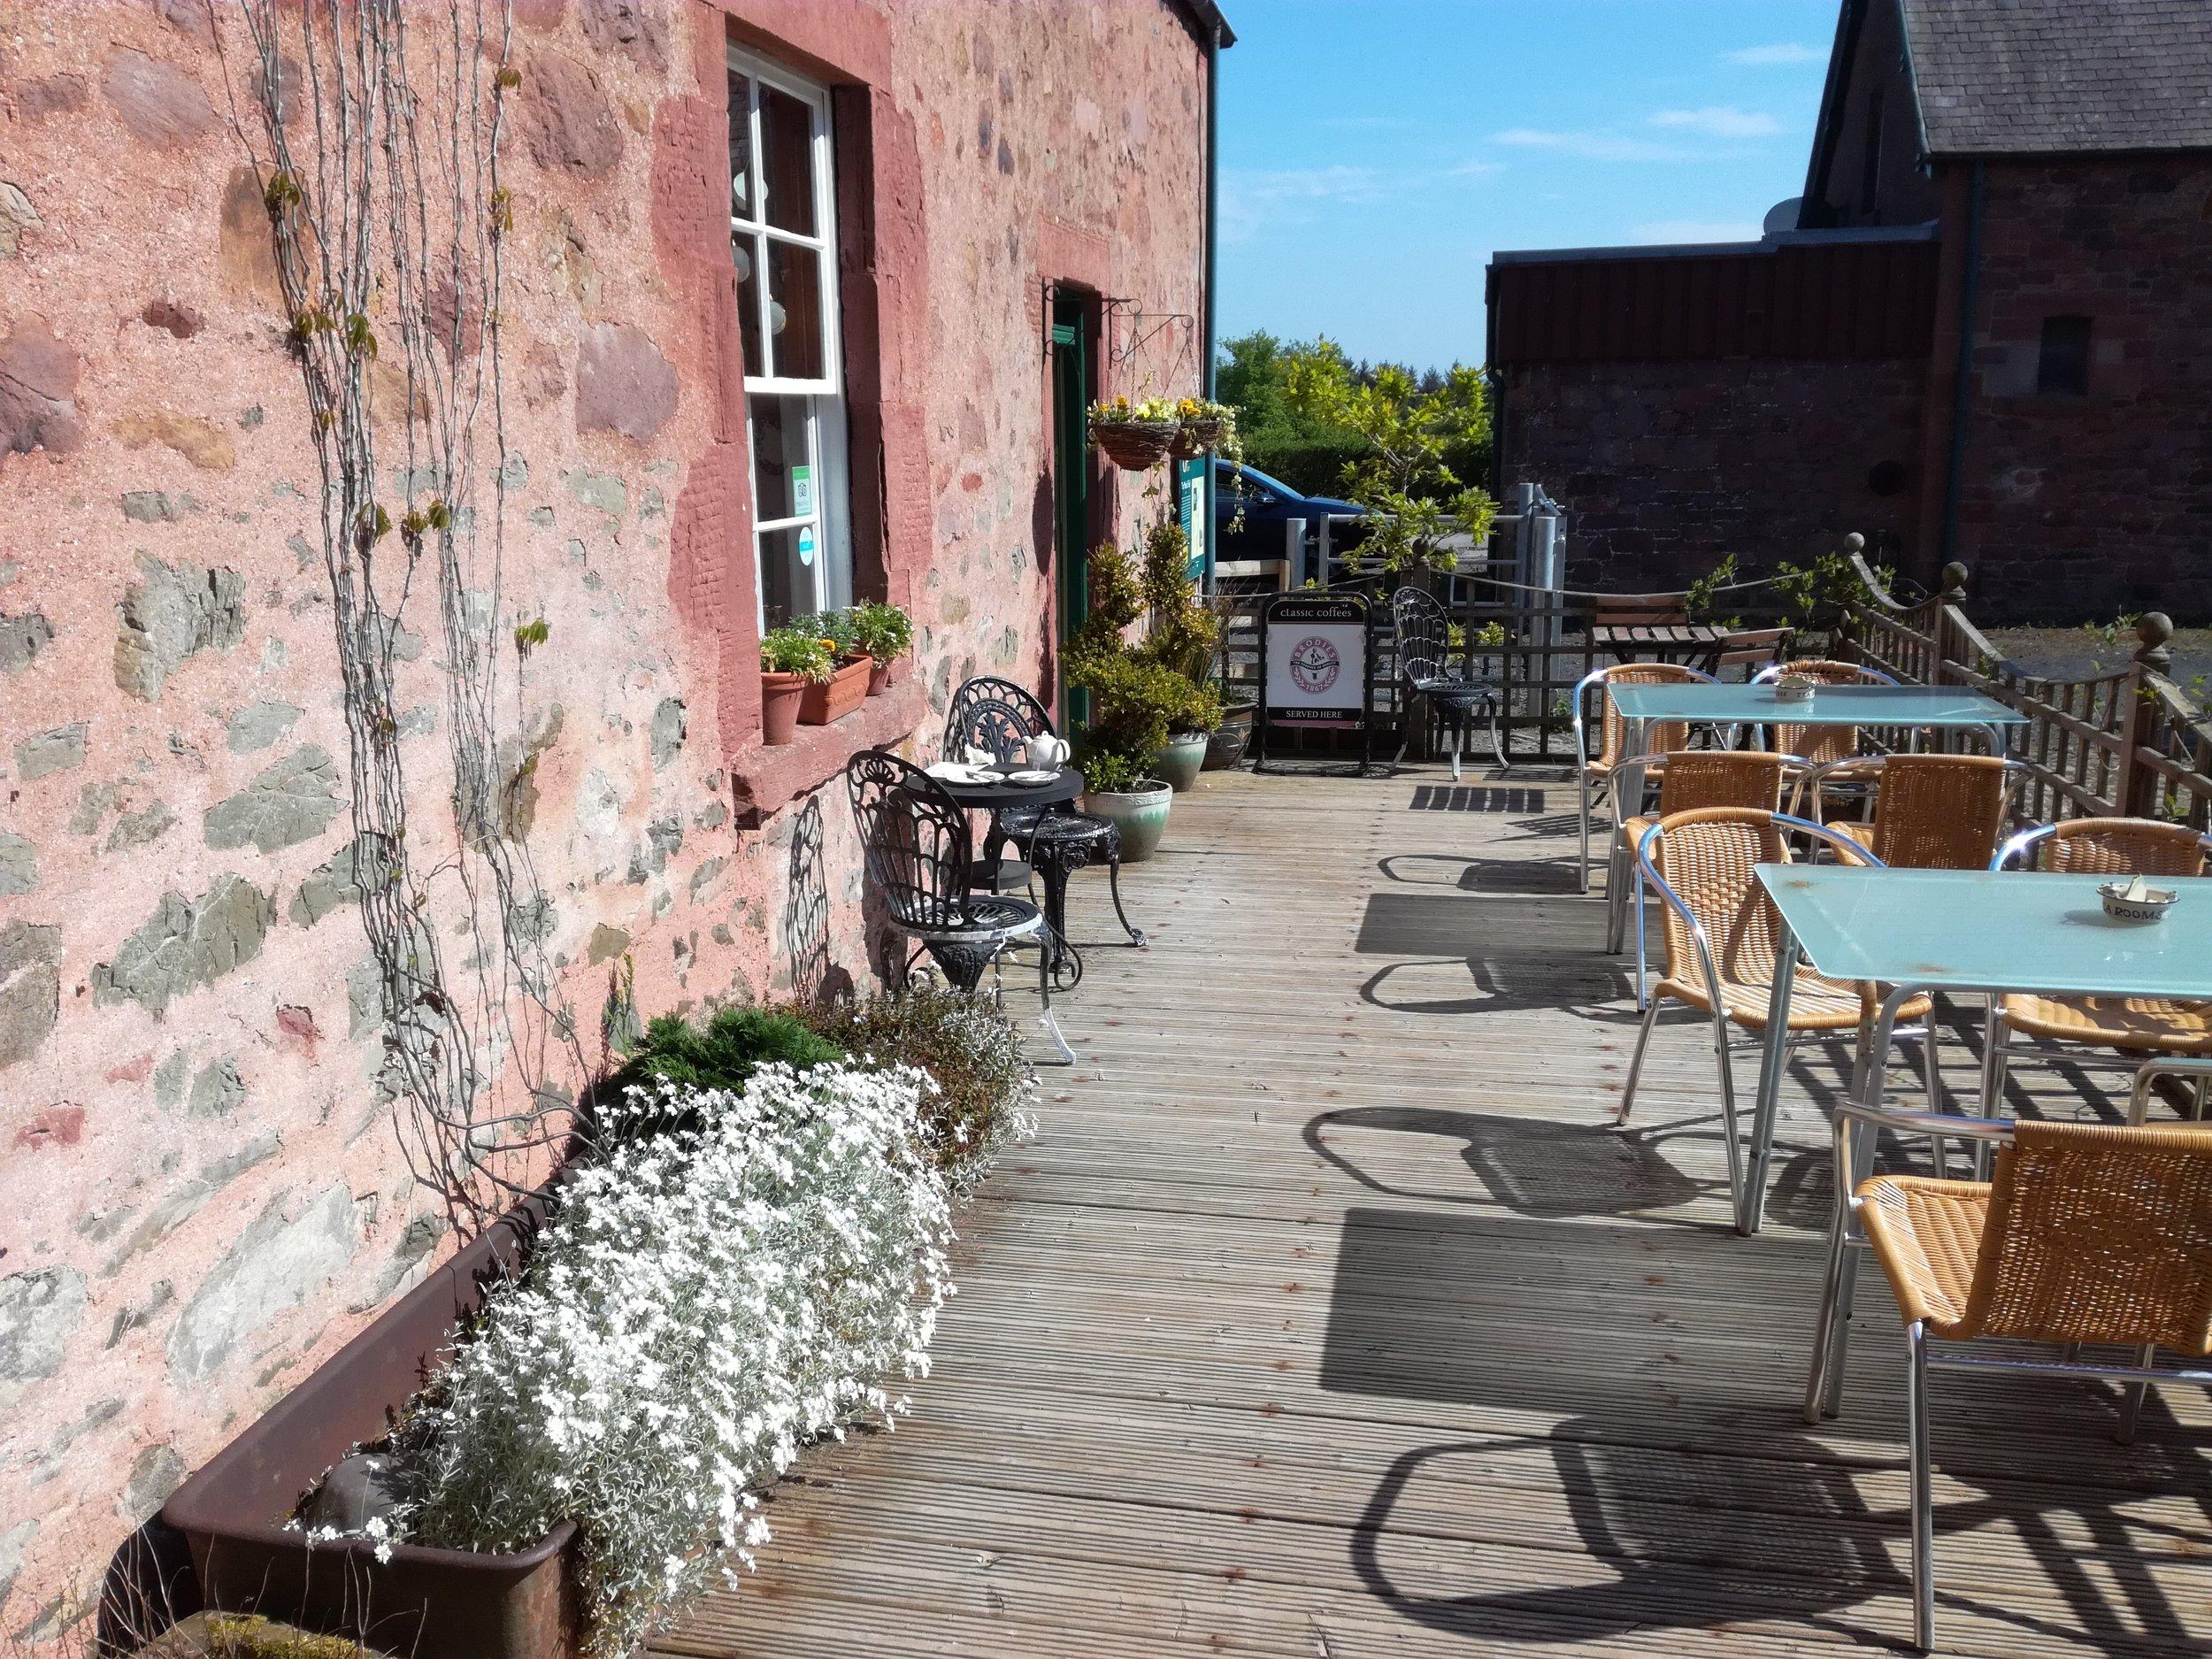 An excellent farm cafe at Old Melrose